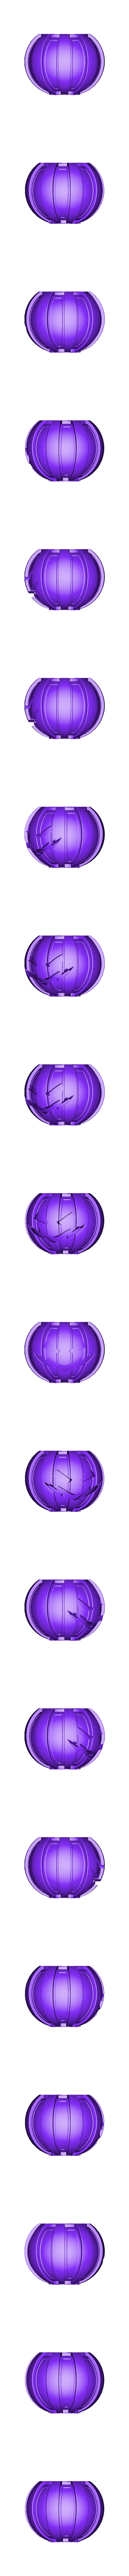 03.STL Download 3MF file Green goblin bombs from the Spide-Man comics • 3D print model, vetrock